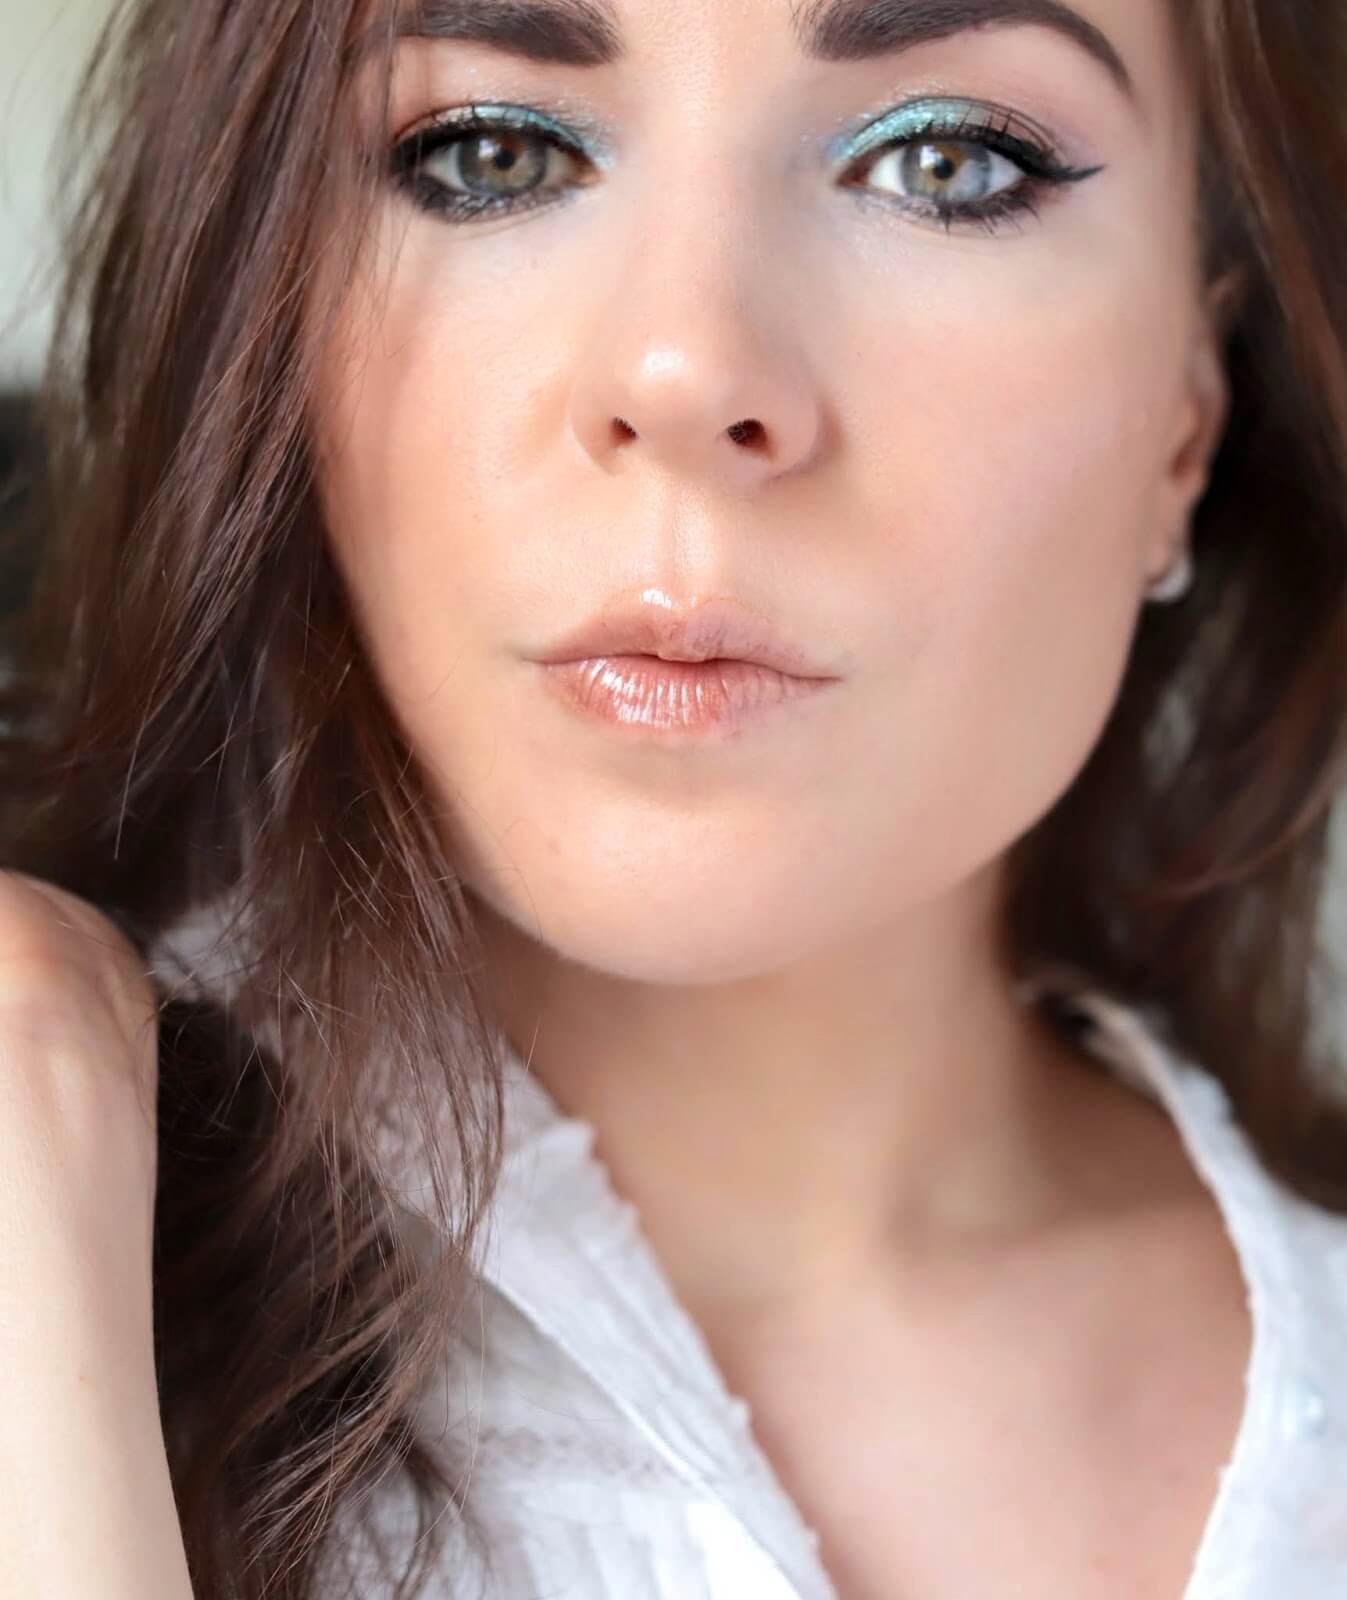 Nars Maquillage été 2020 Pigment Yeux Bronzer Laguna